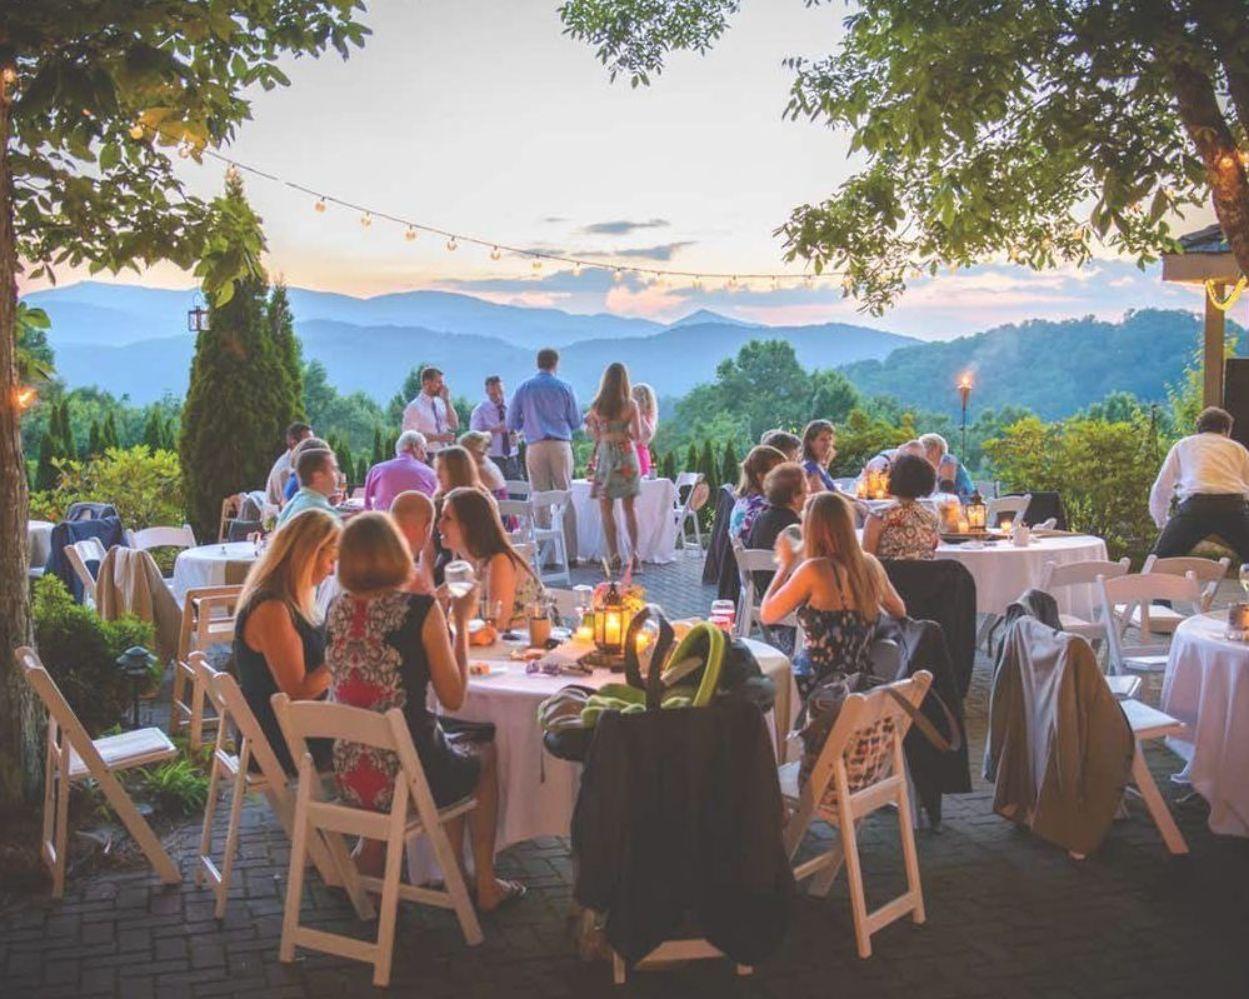 38++ Small wedding venues near boone nc ideas